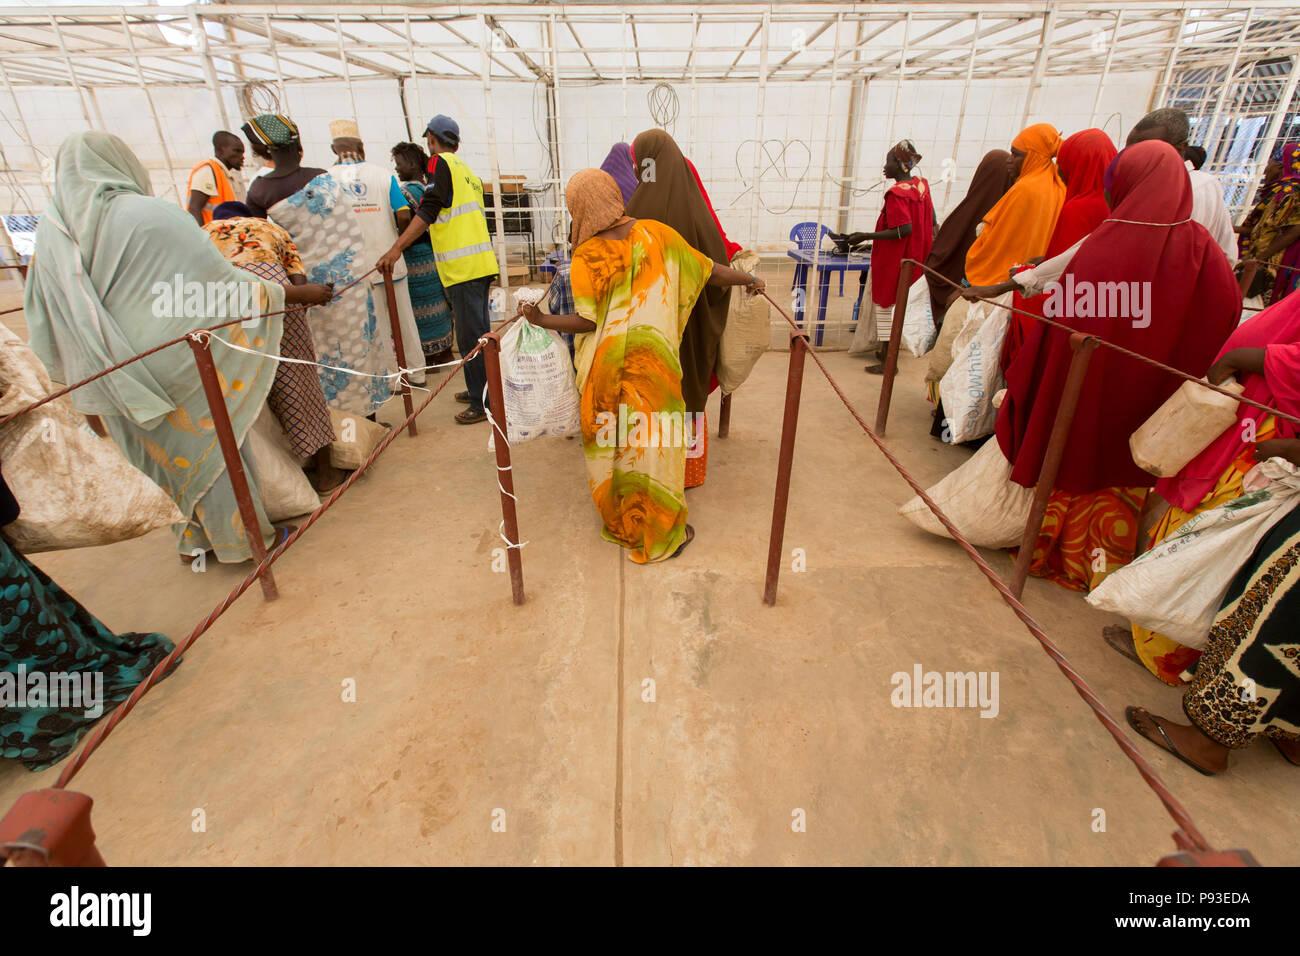 Kakuma, Kenya - Food distribution by the humanitarian aid organization World Food Program in a secure warehouse in the Kakuma refugee camp. Stock Photo